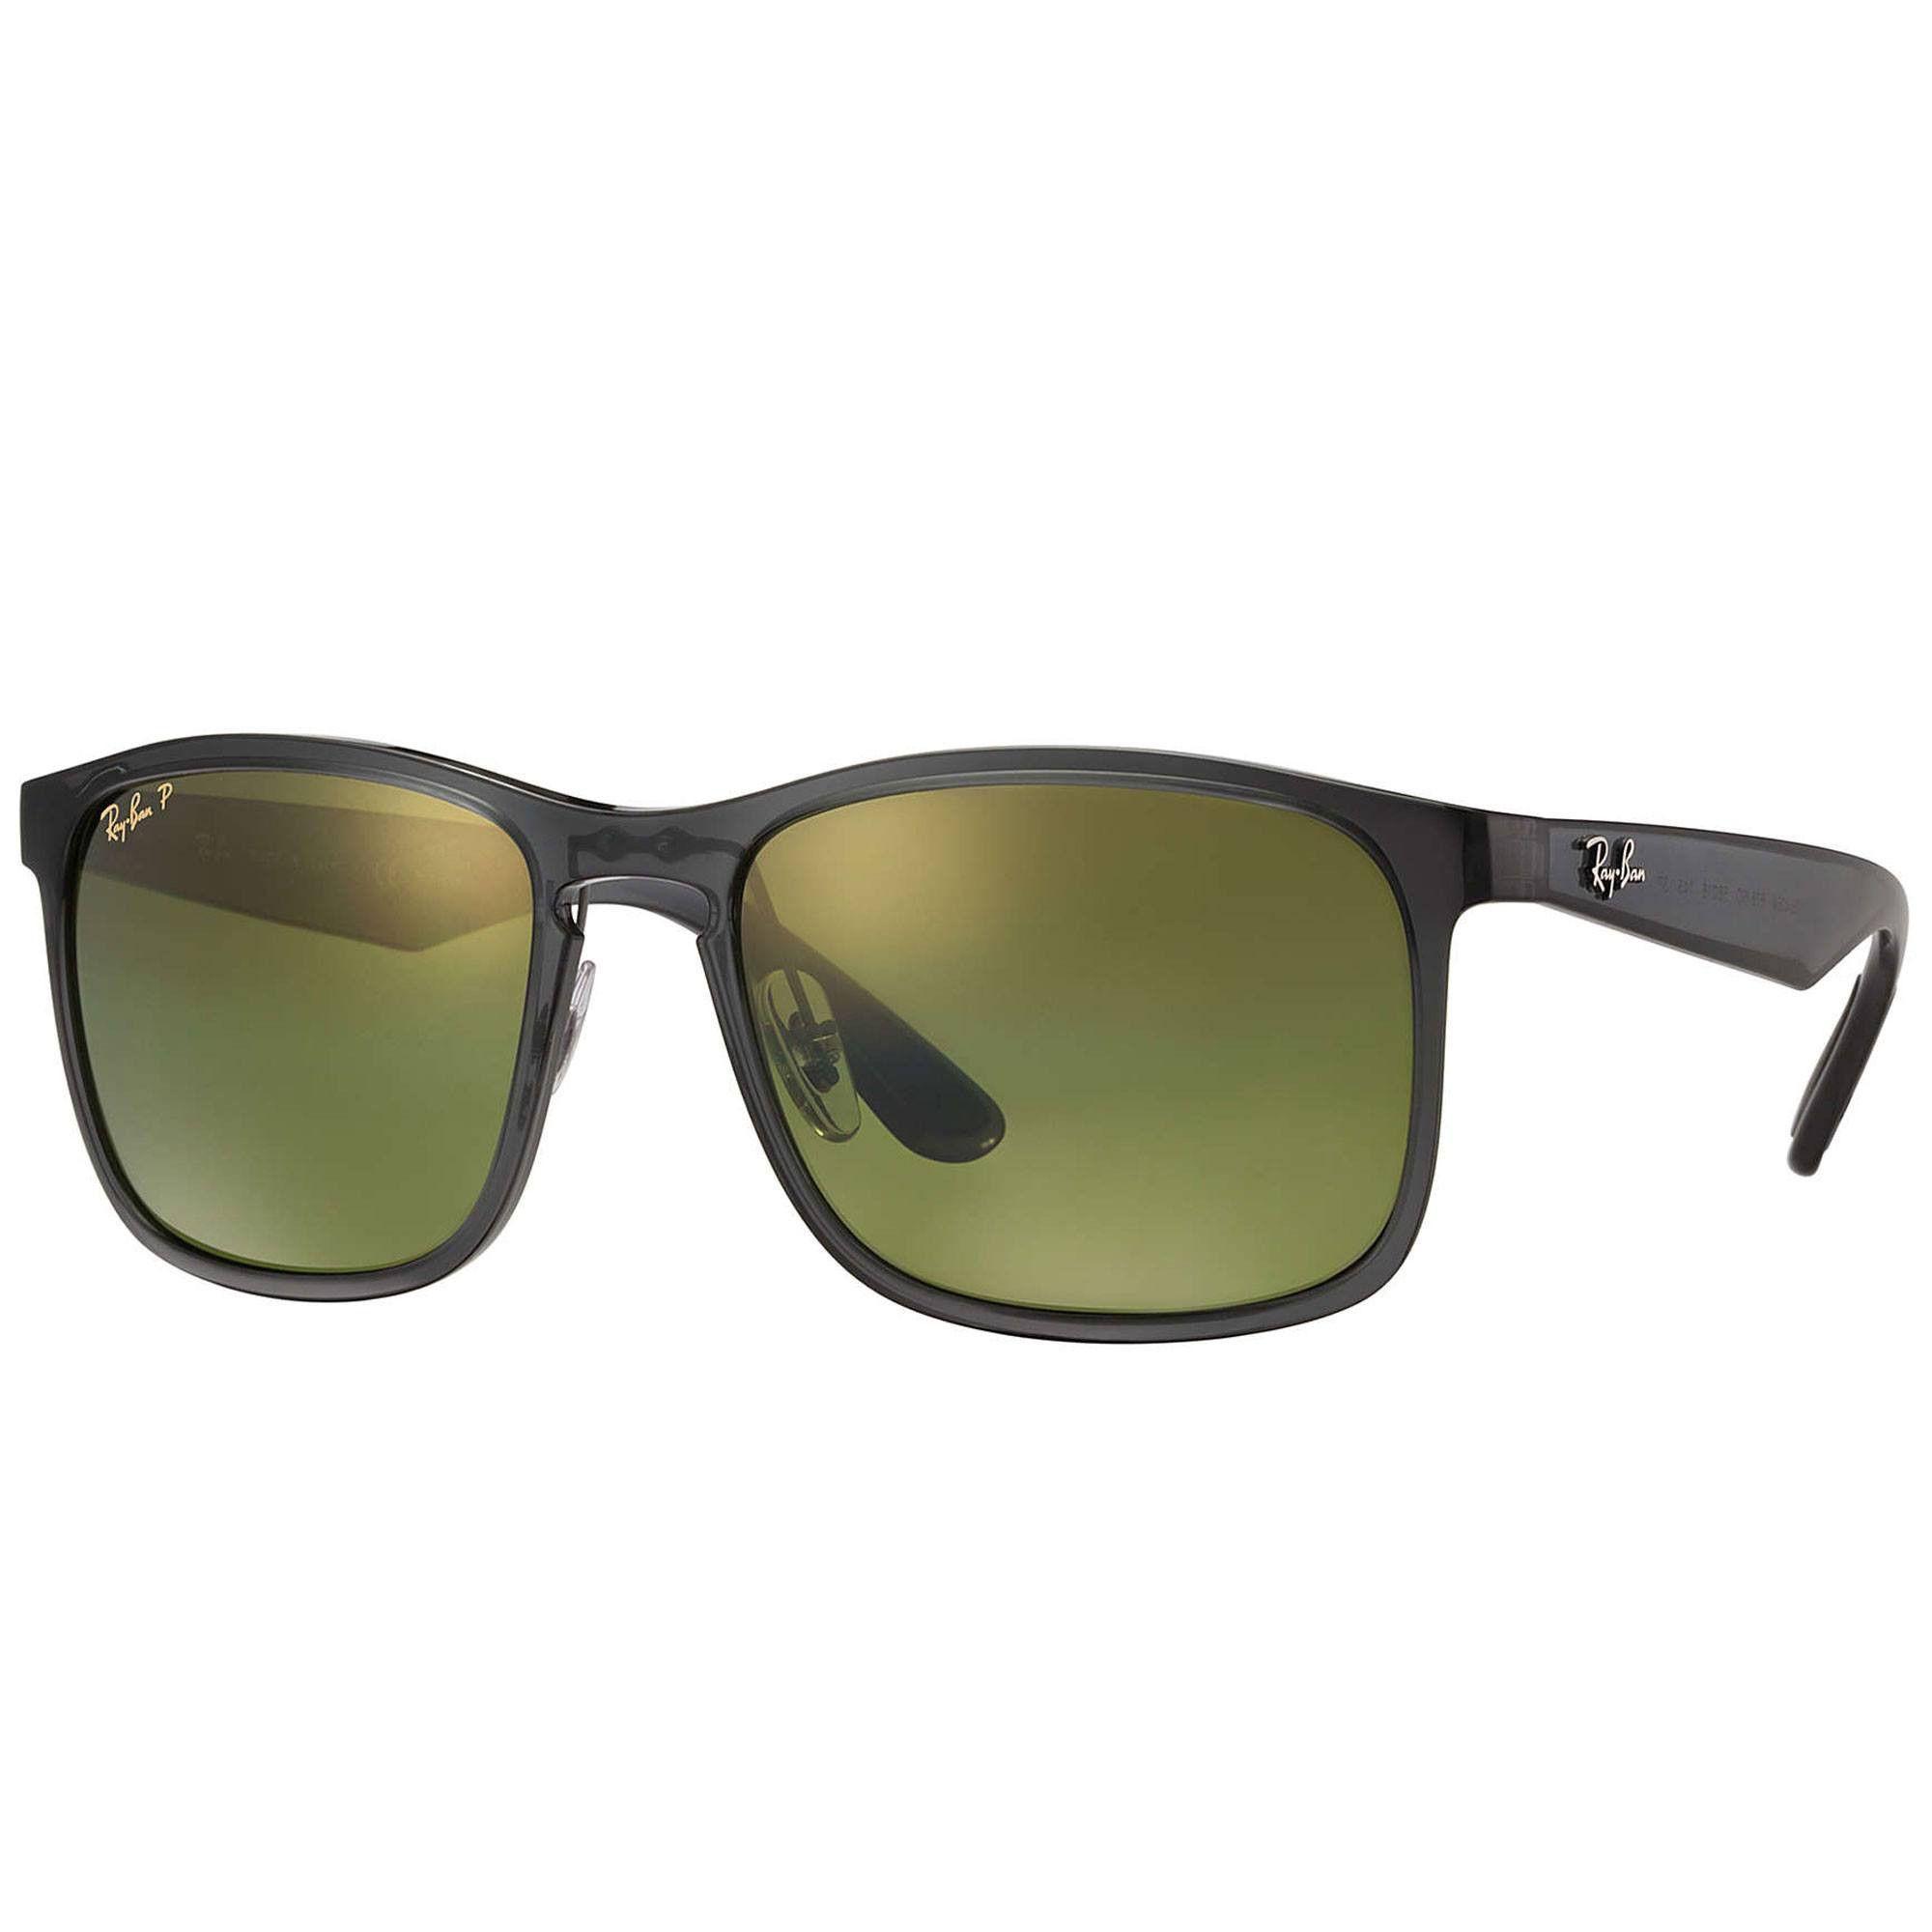 e8c7b3e67e Ray-Ban Shiny Grey Gold RB4264 Polarized Sunglasses